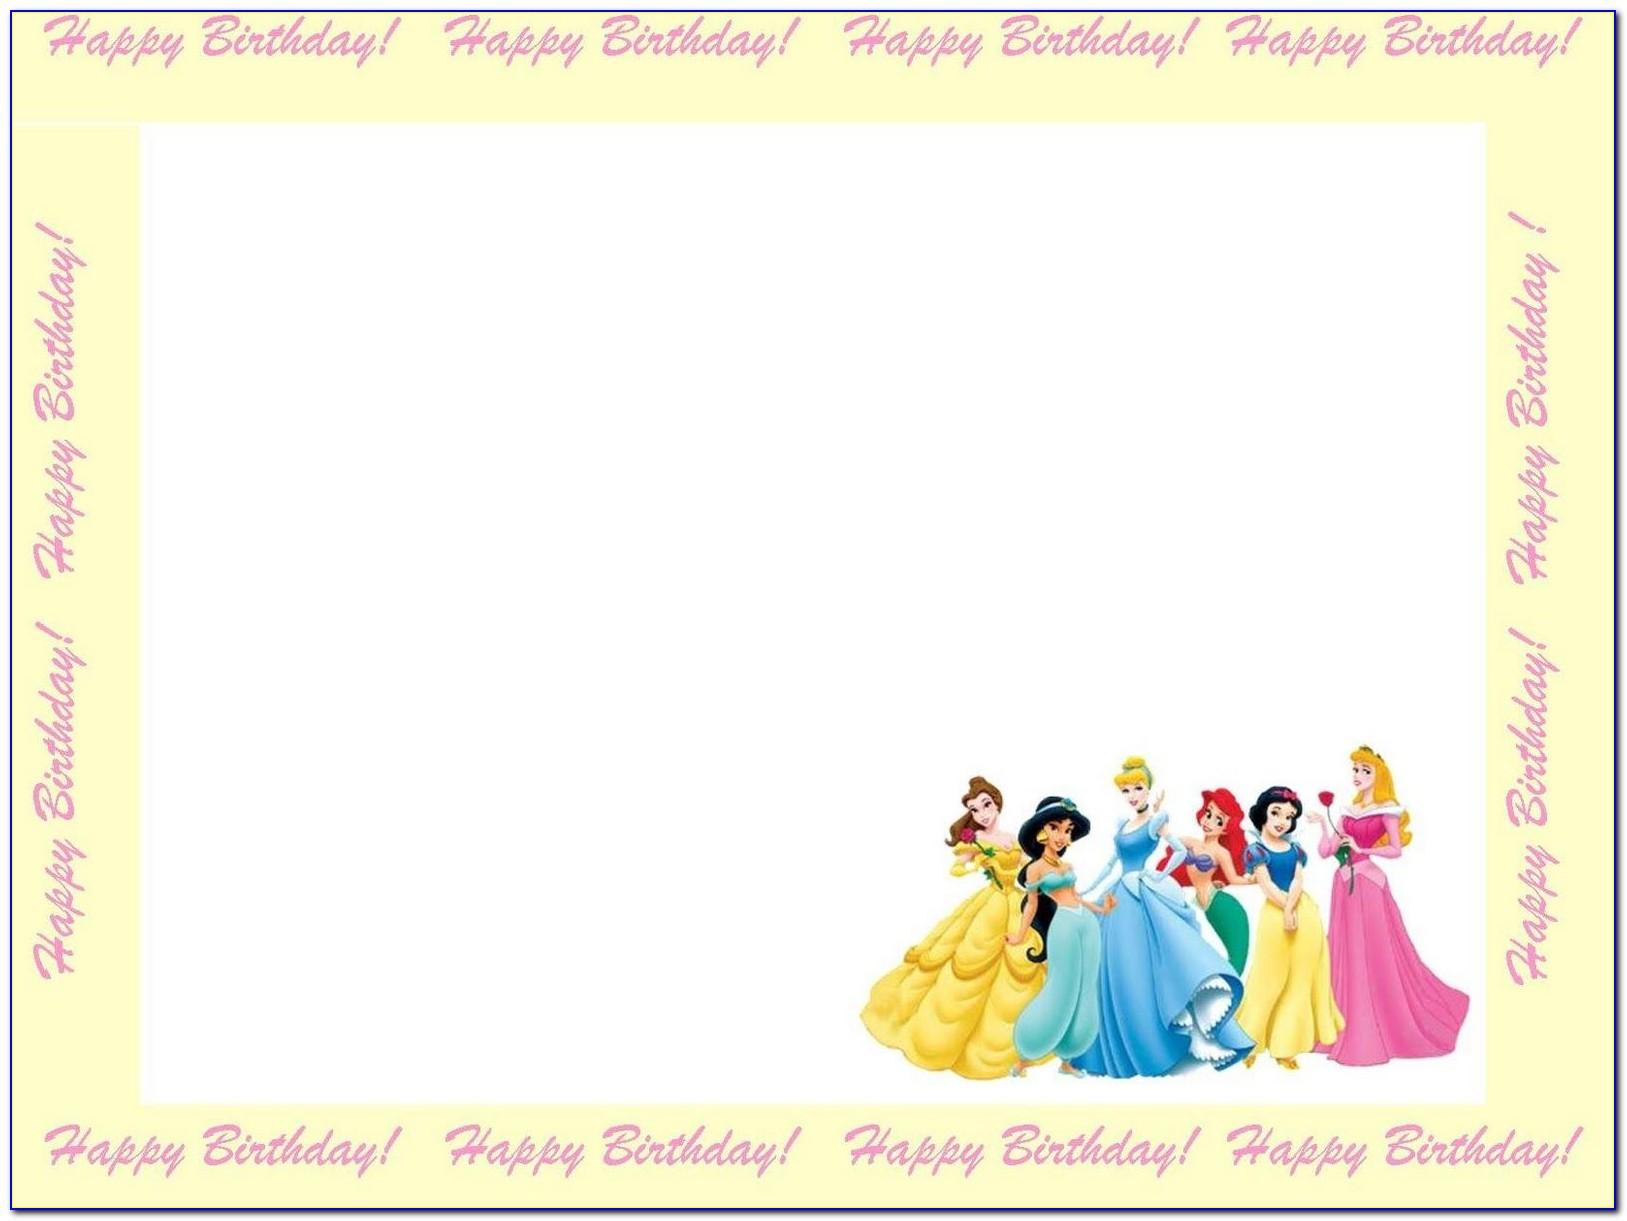 Free Printable Disney Princess Happy Birthday Cards